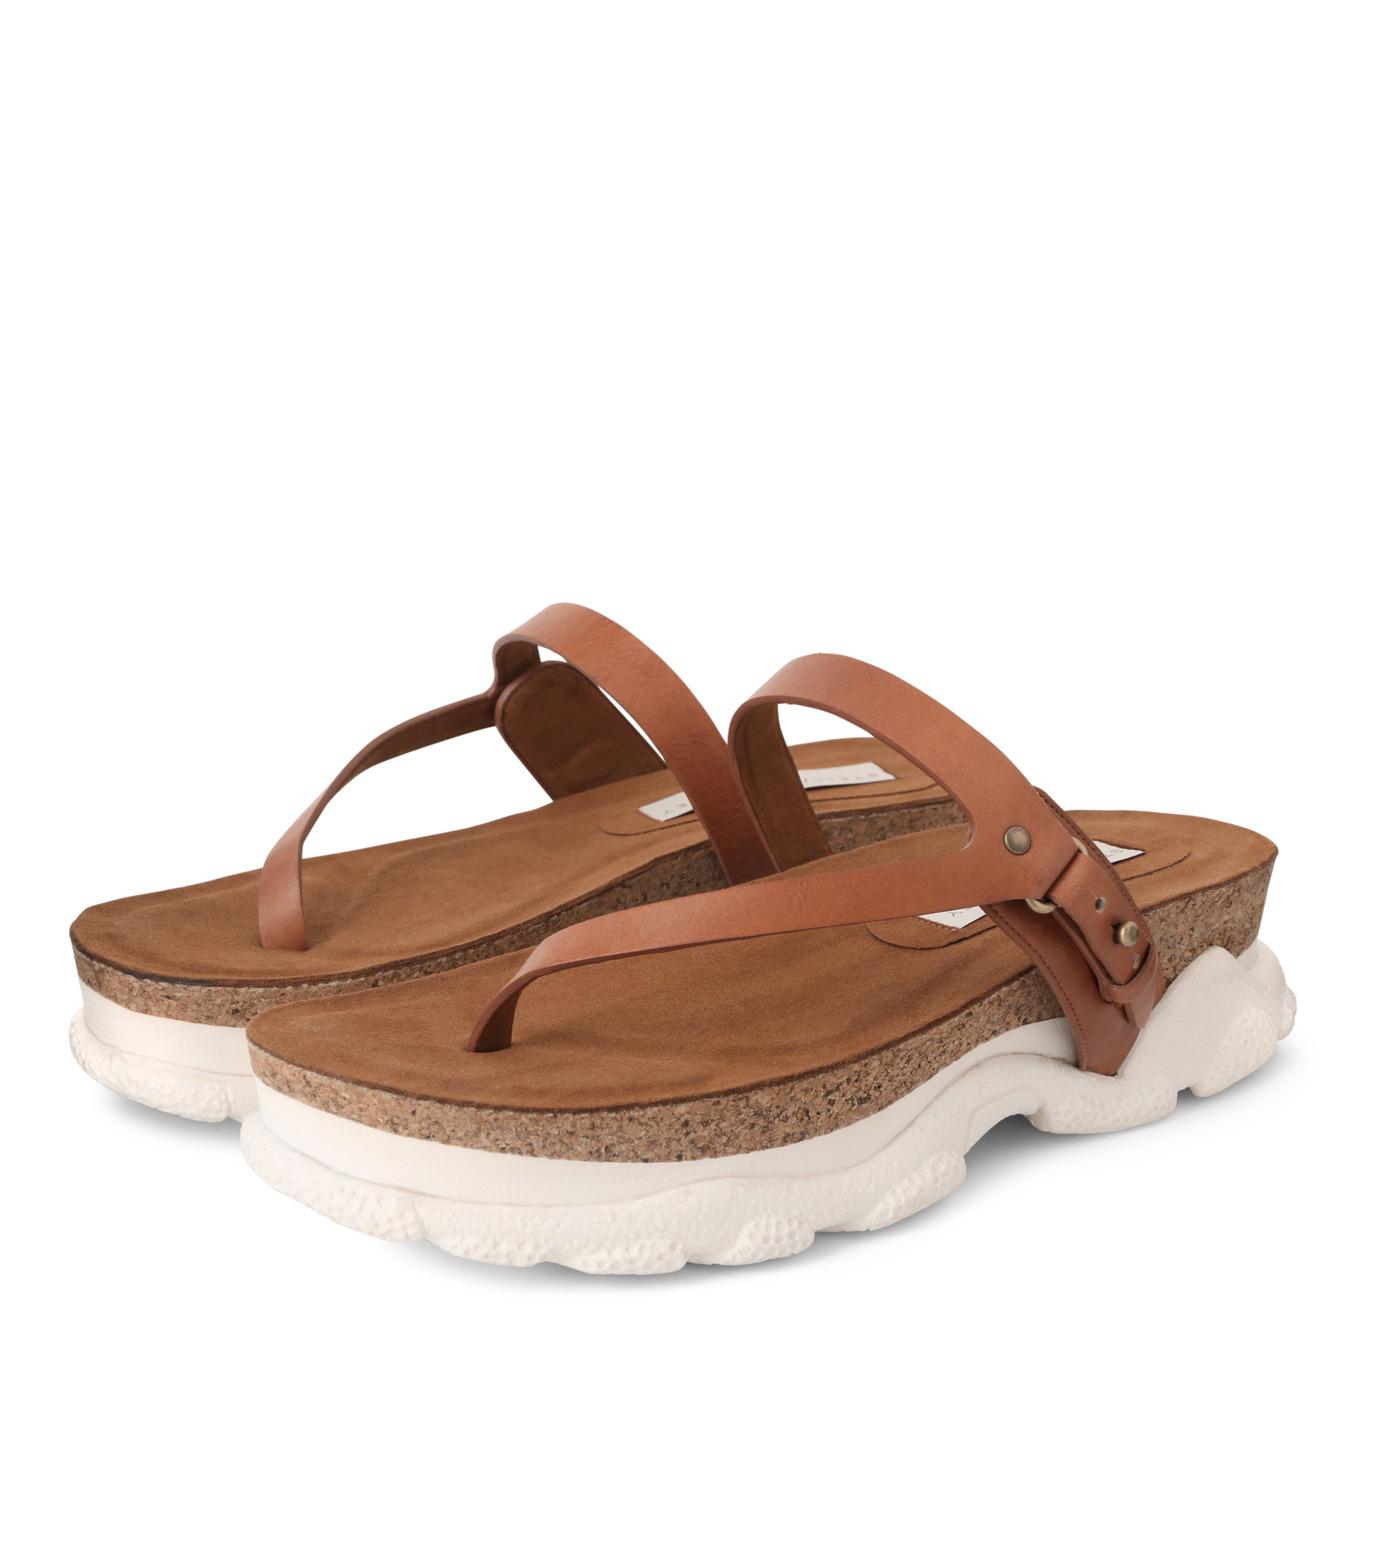 Stella McCartney(ステラマッカートニー)のSneaker Sandal-BROWN(シューズ/shoes)-423387-W0MW0-42 拡大詳細画像3